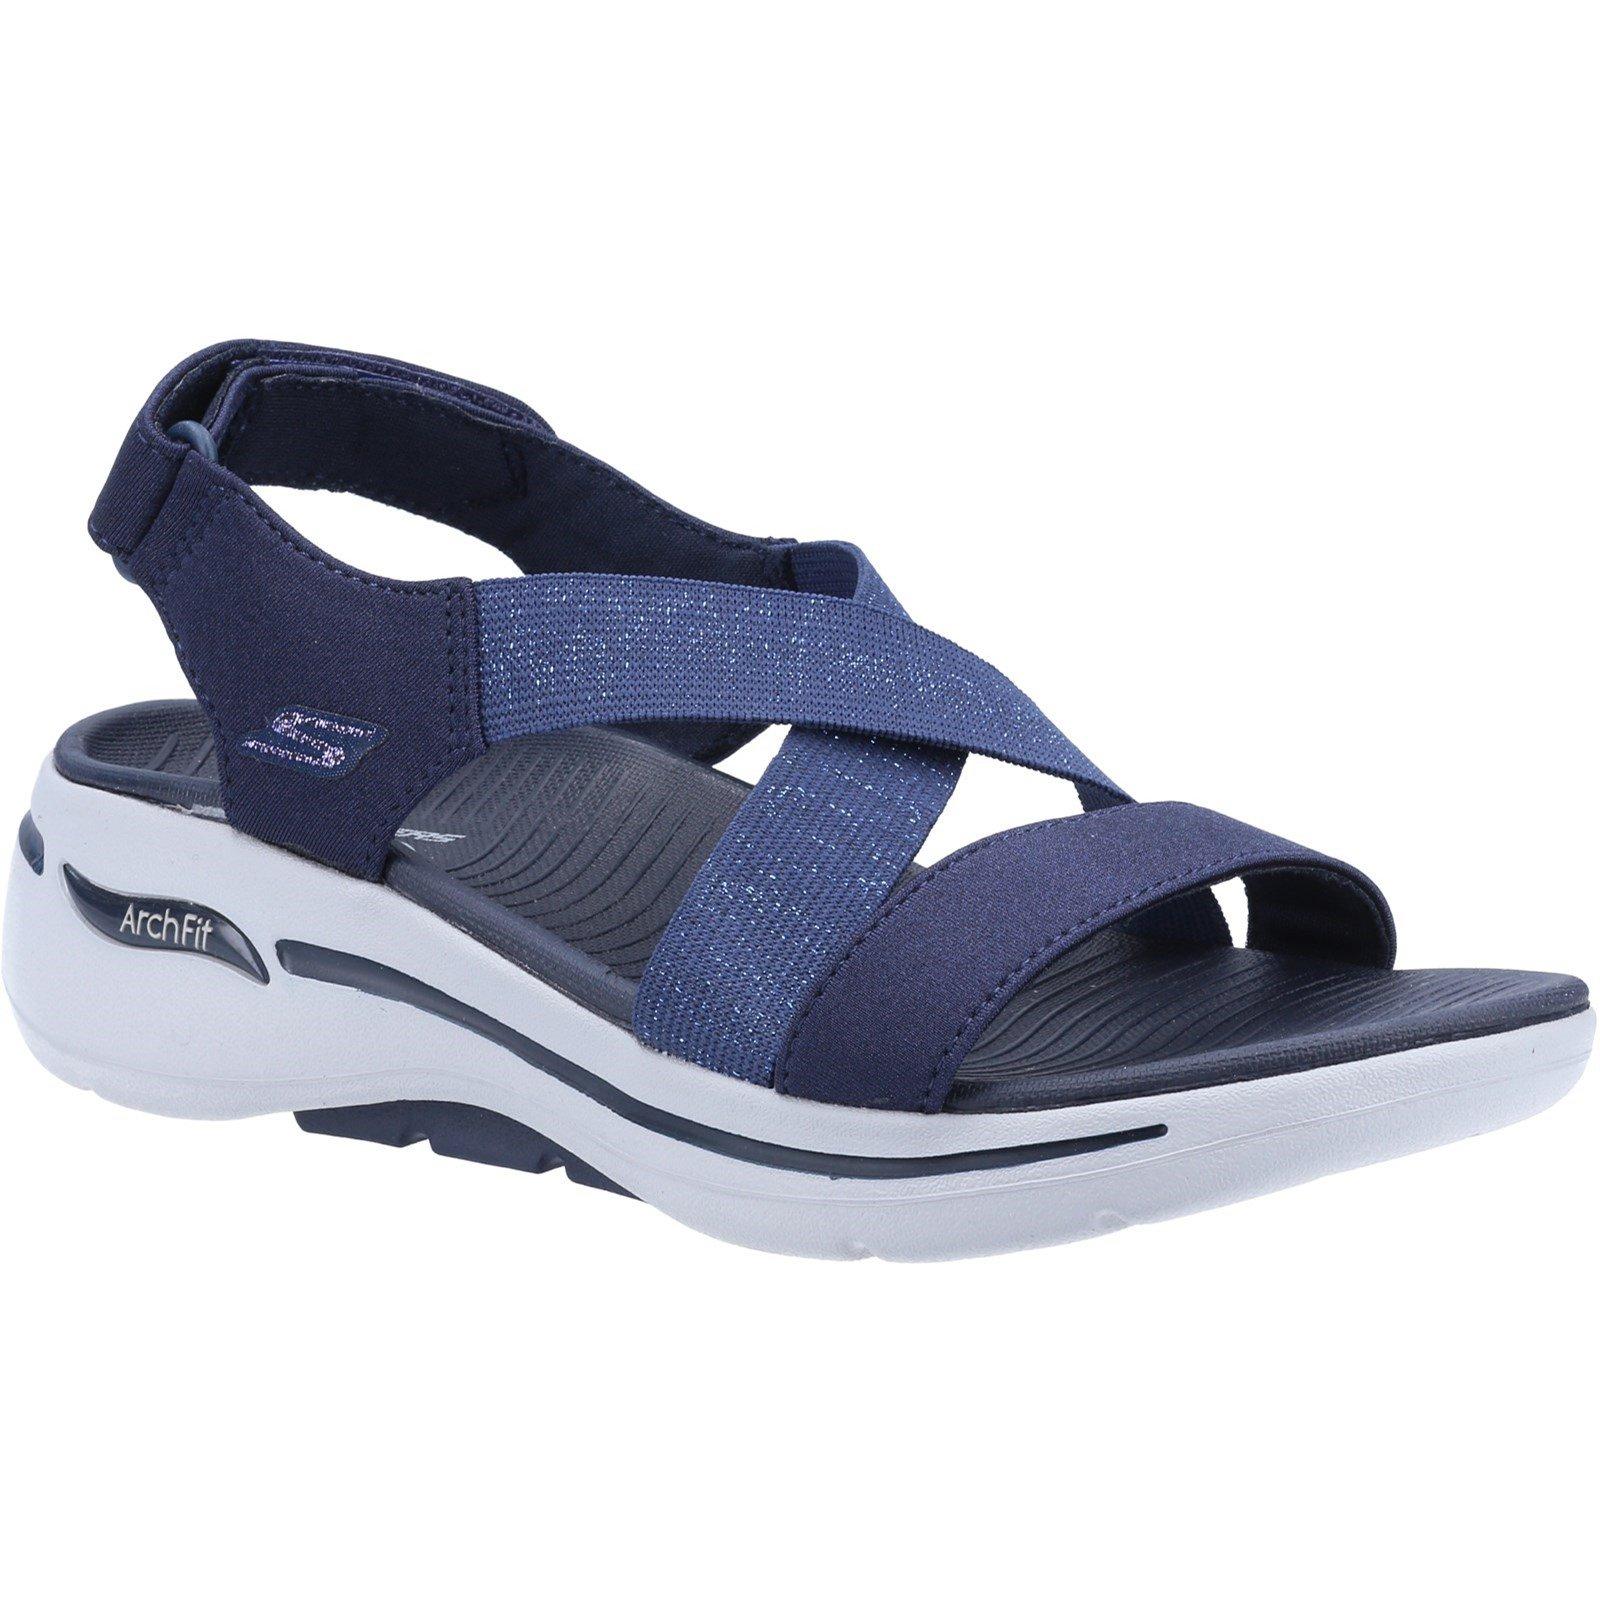 Skechers Women's Go Walk Arch Fit Astonish Summer Sandal Various Colours 32153 - Navy 5